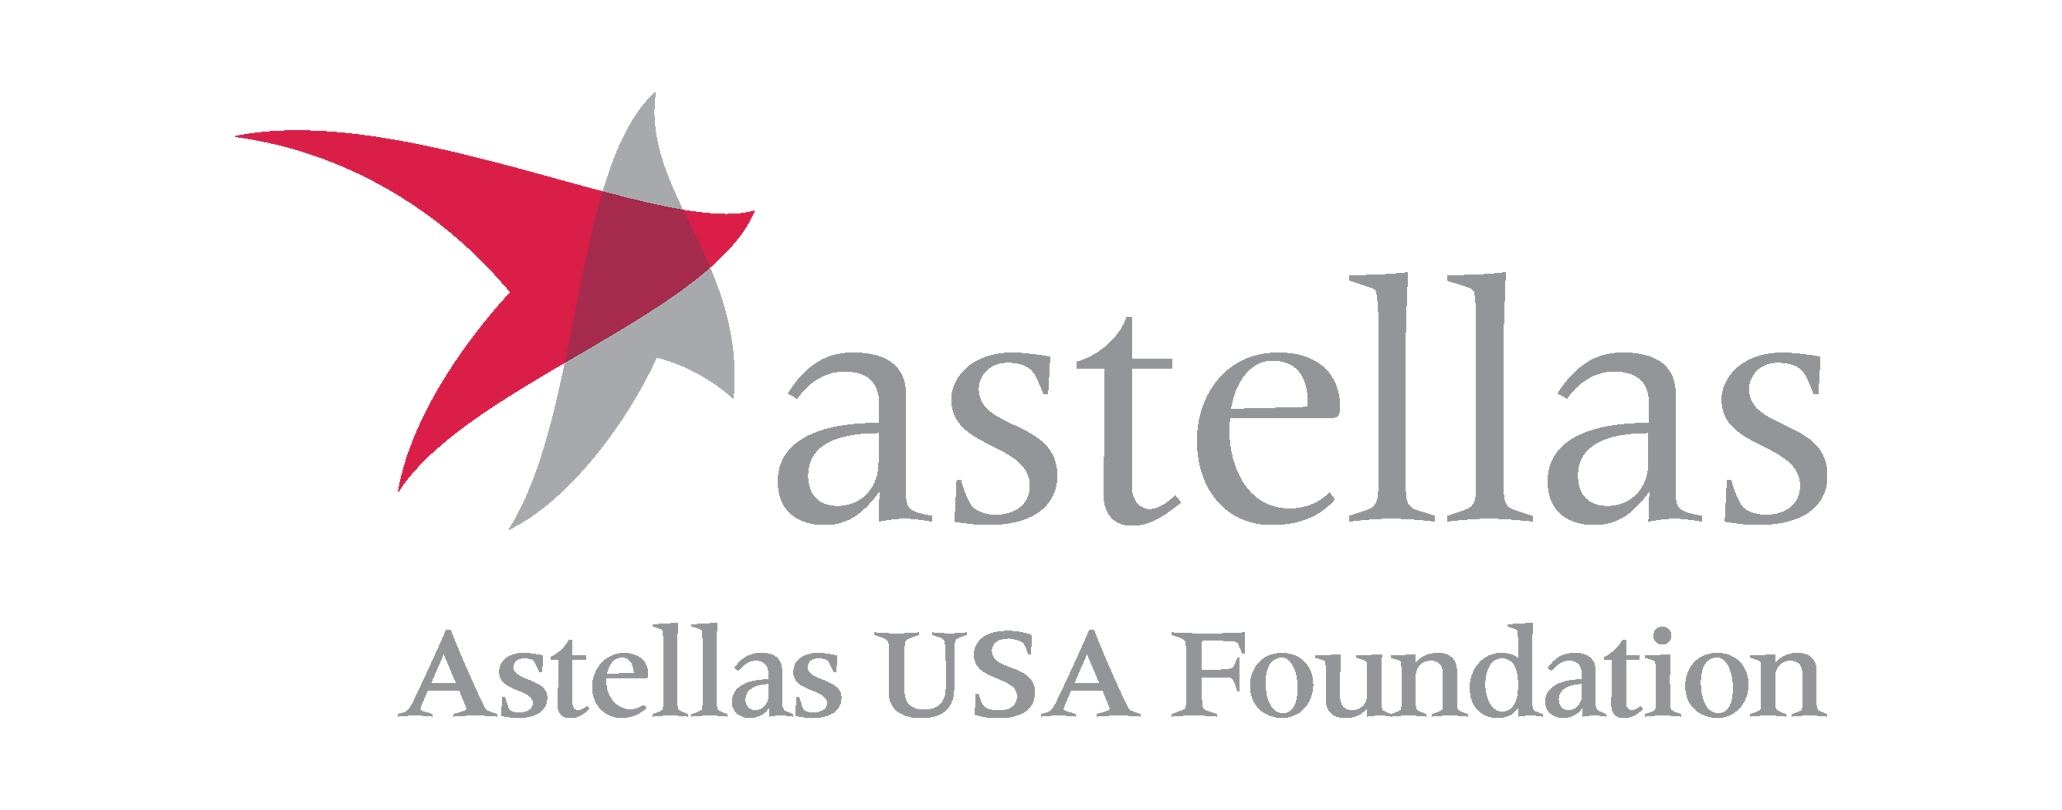 Astellas USA Foundationlogo